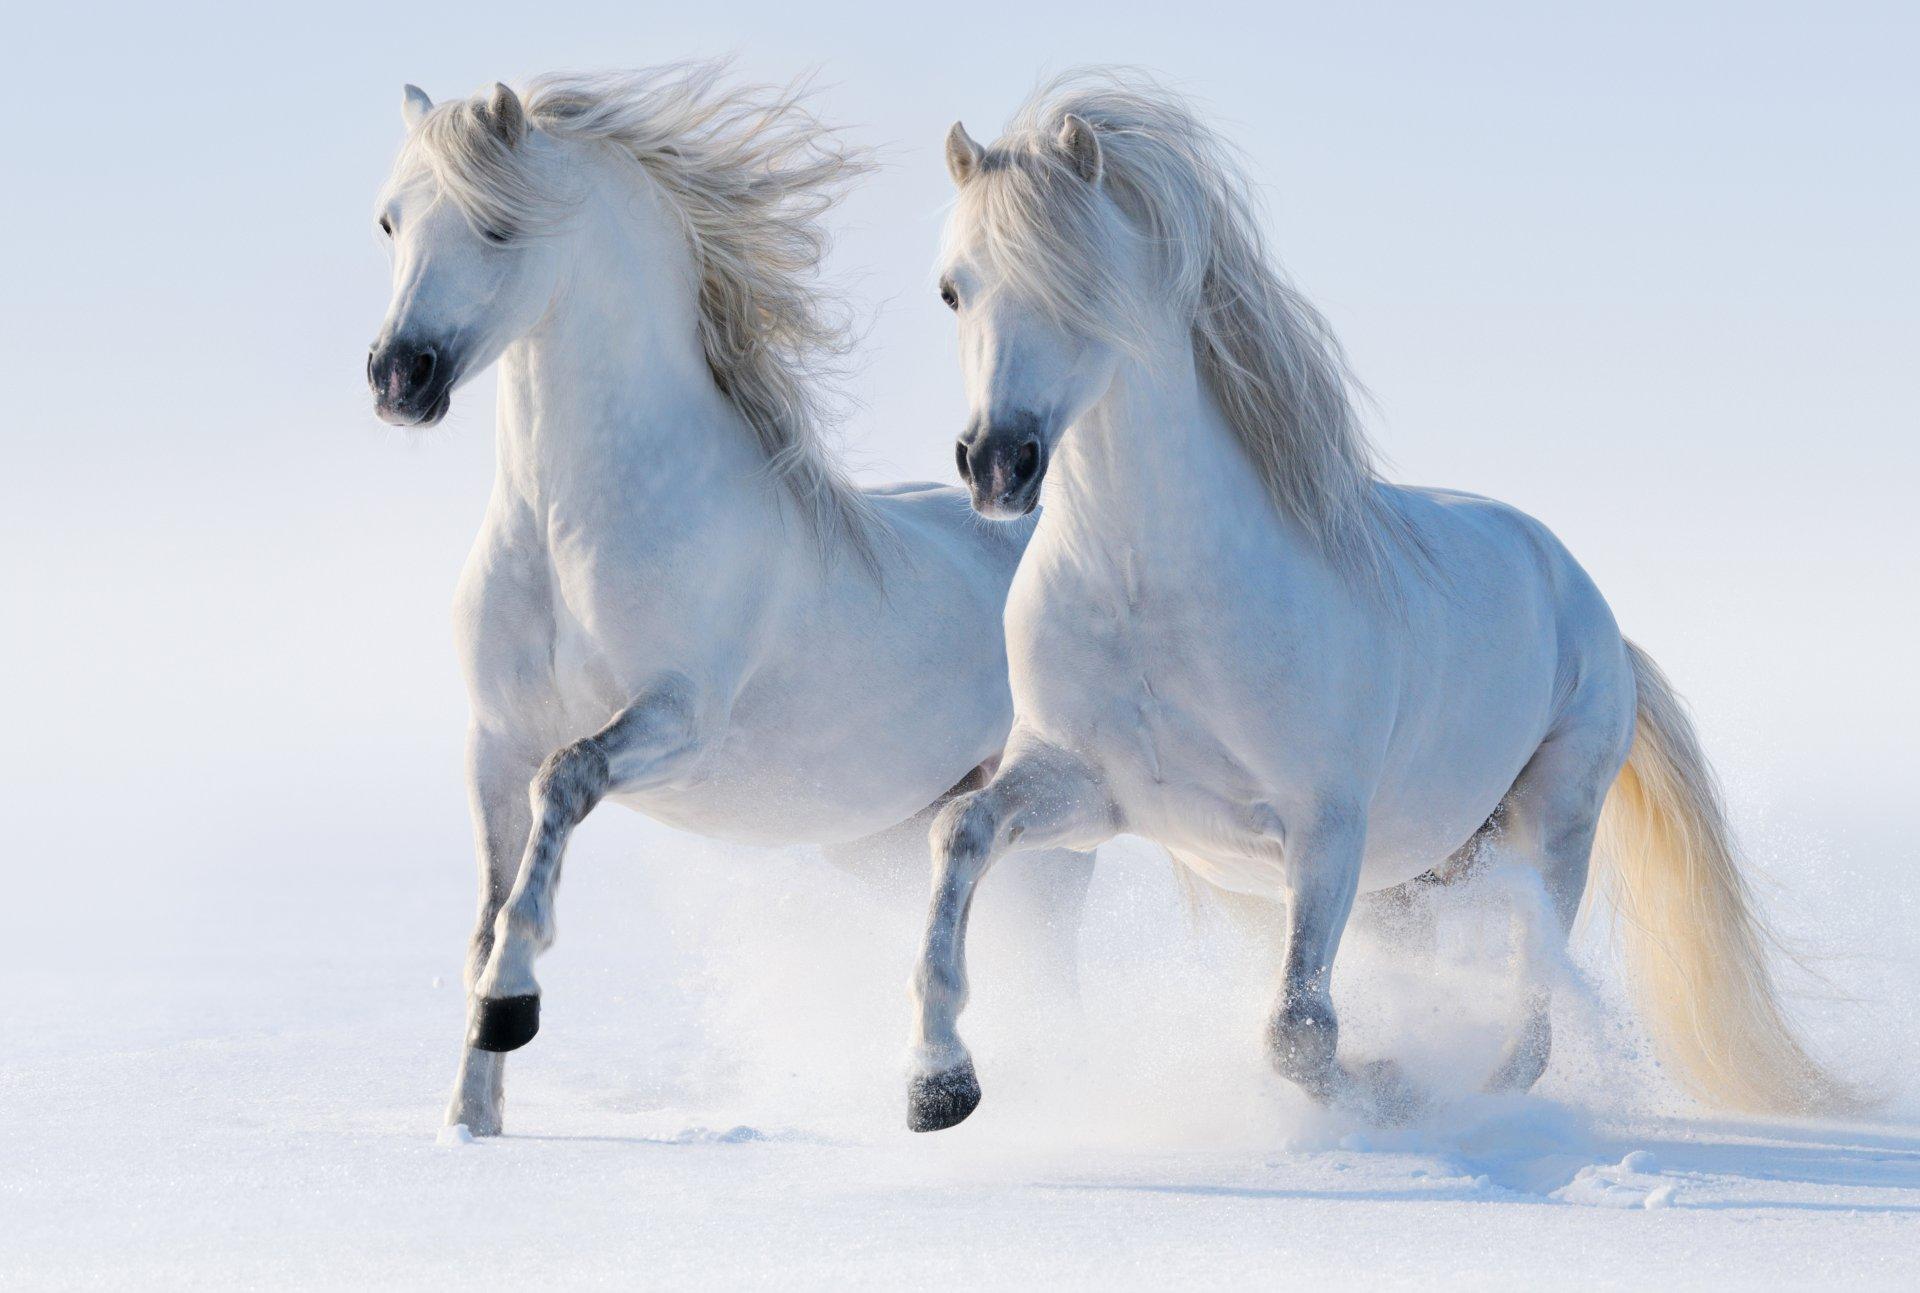 Running white horse wallpapers